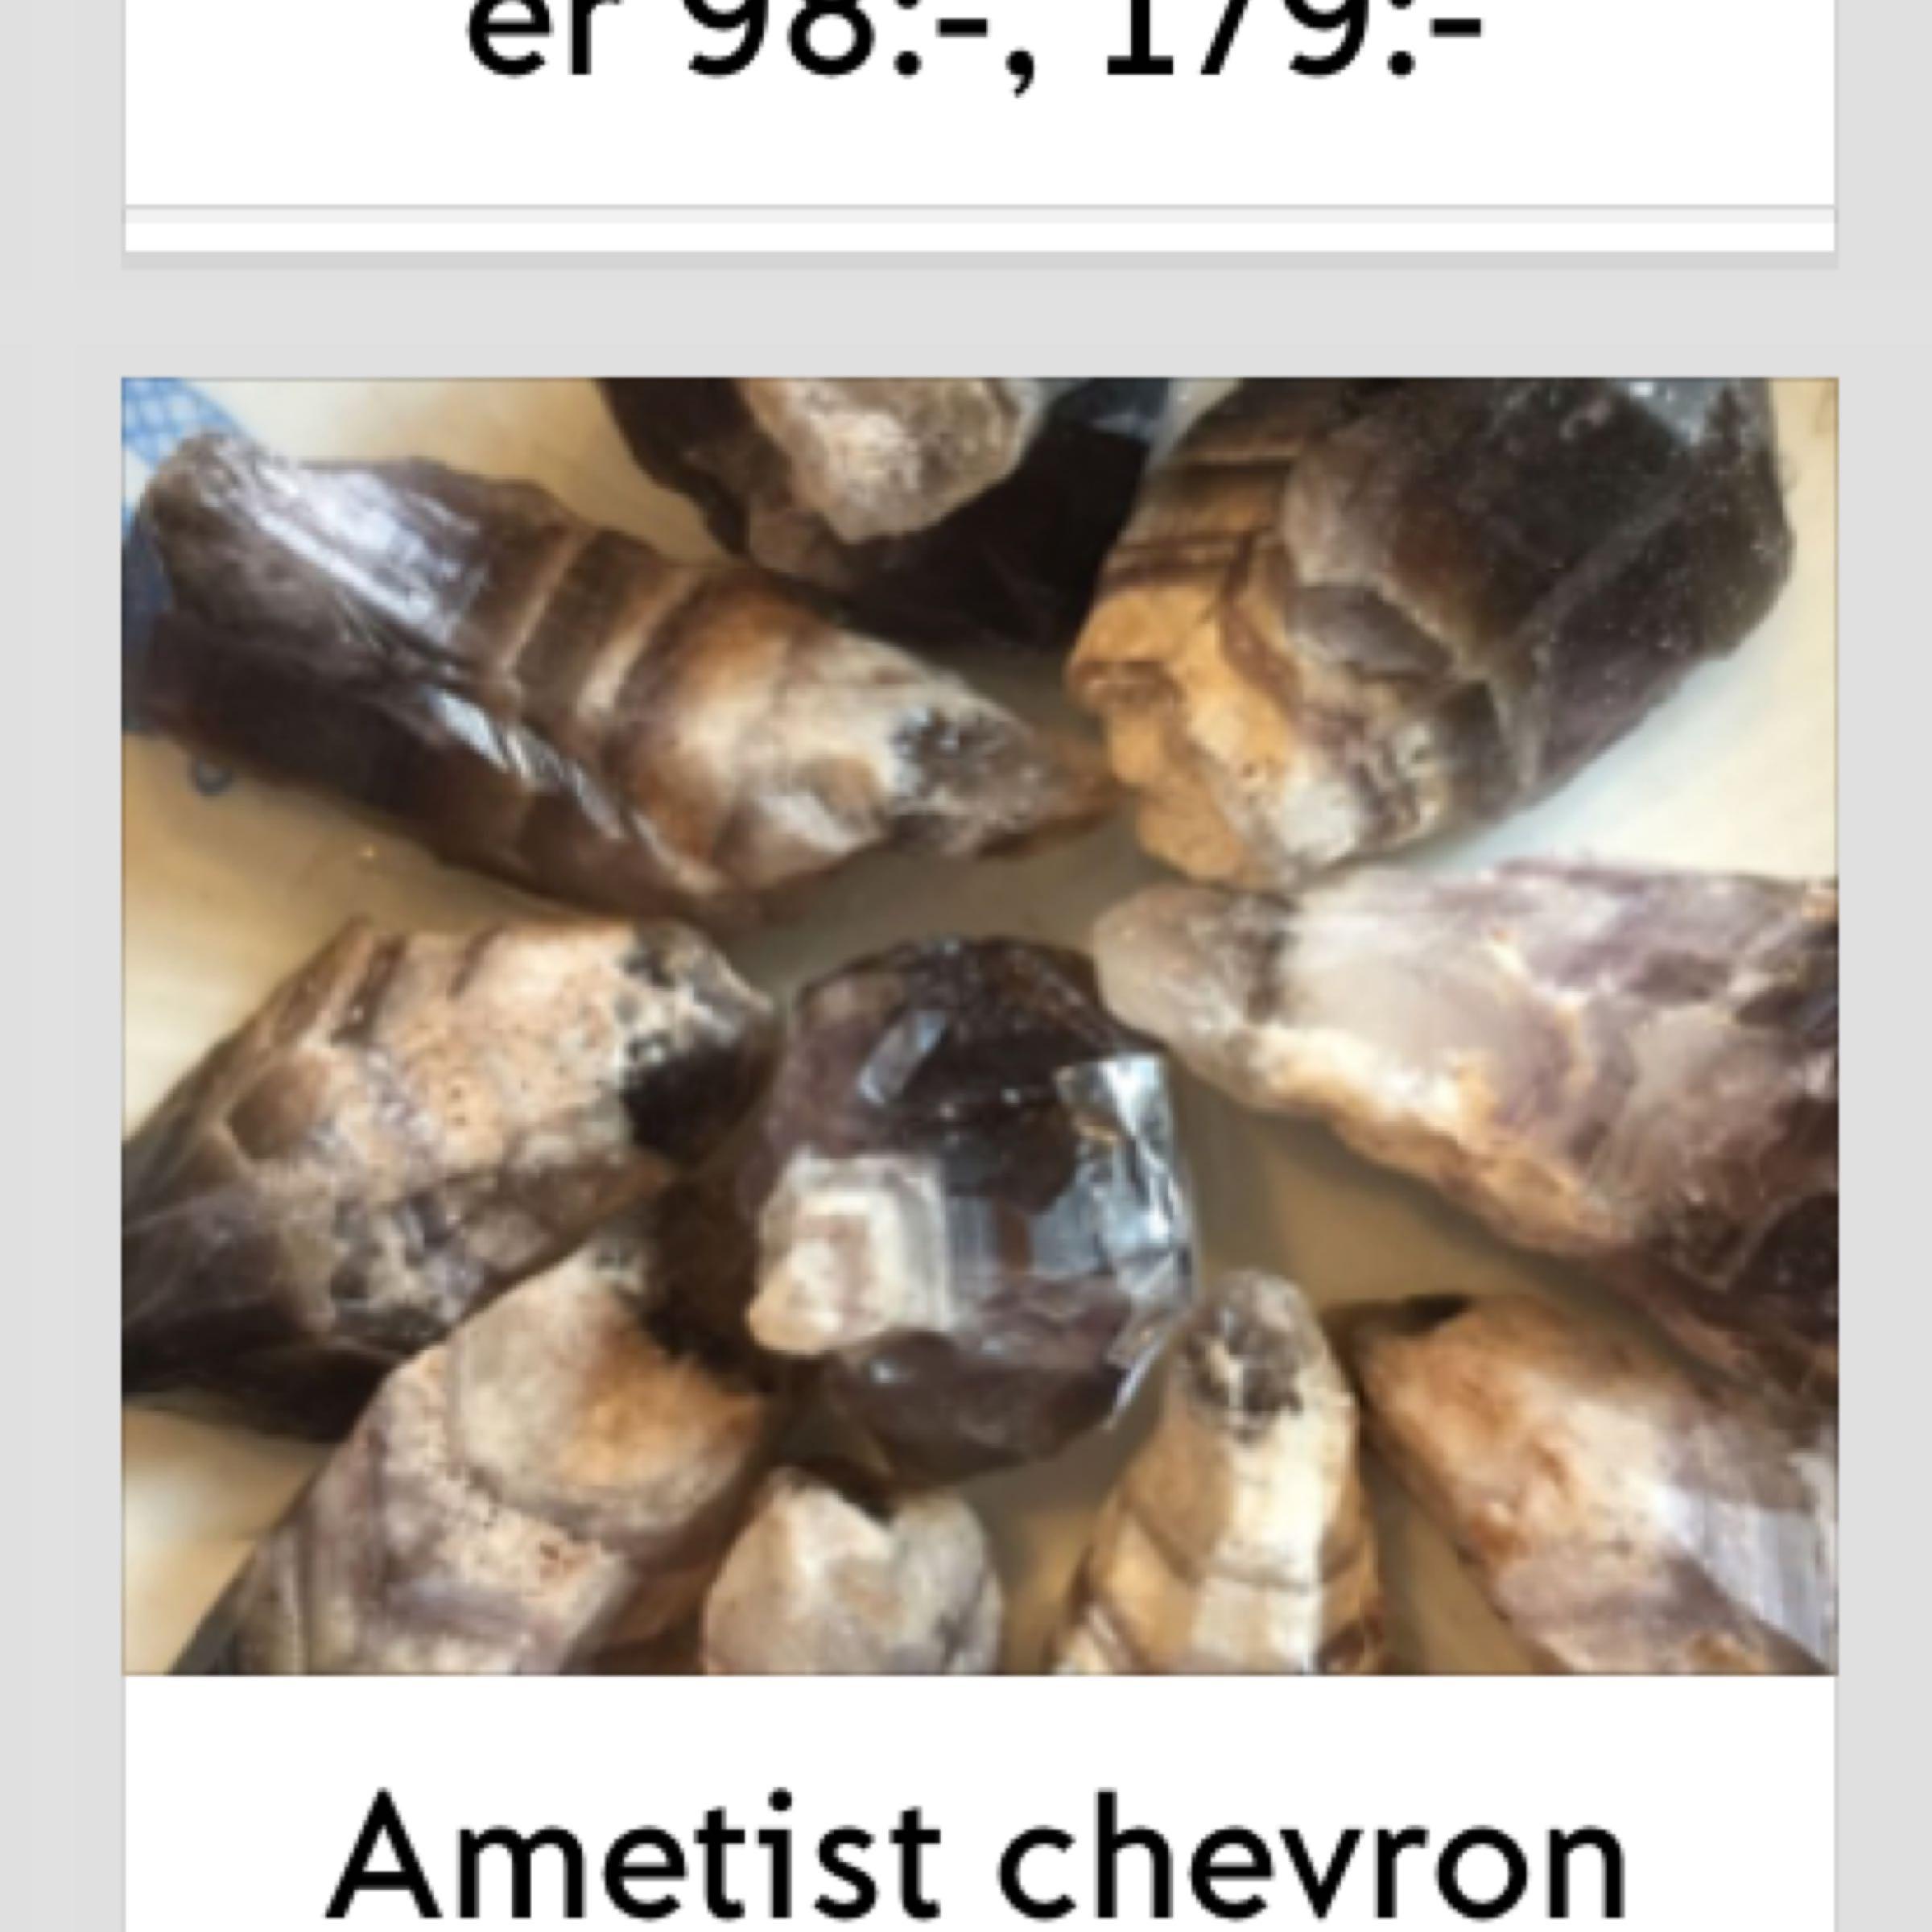 Ametist chevron